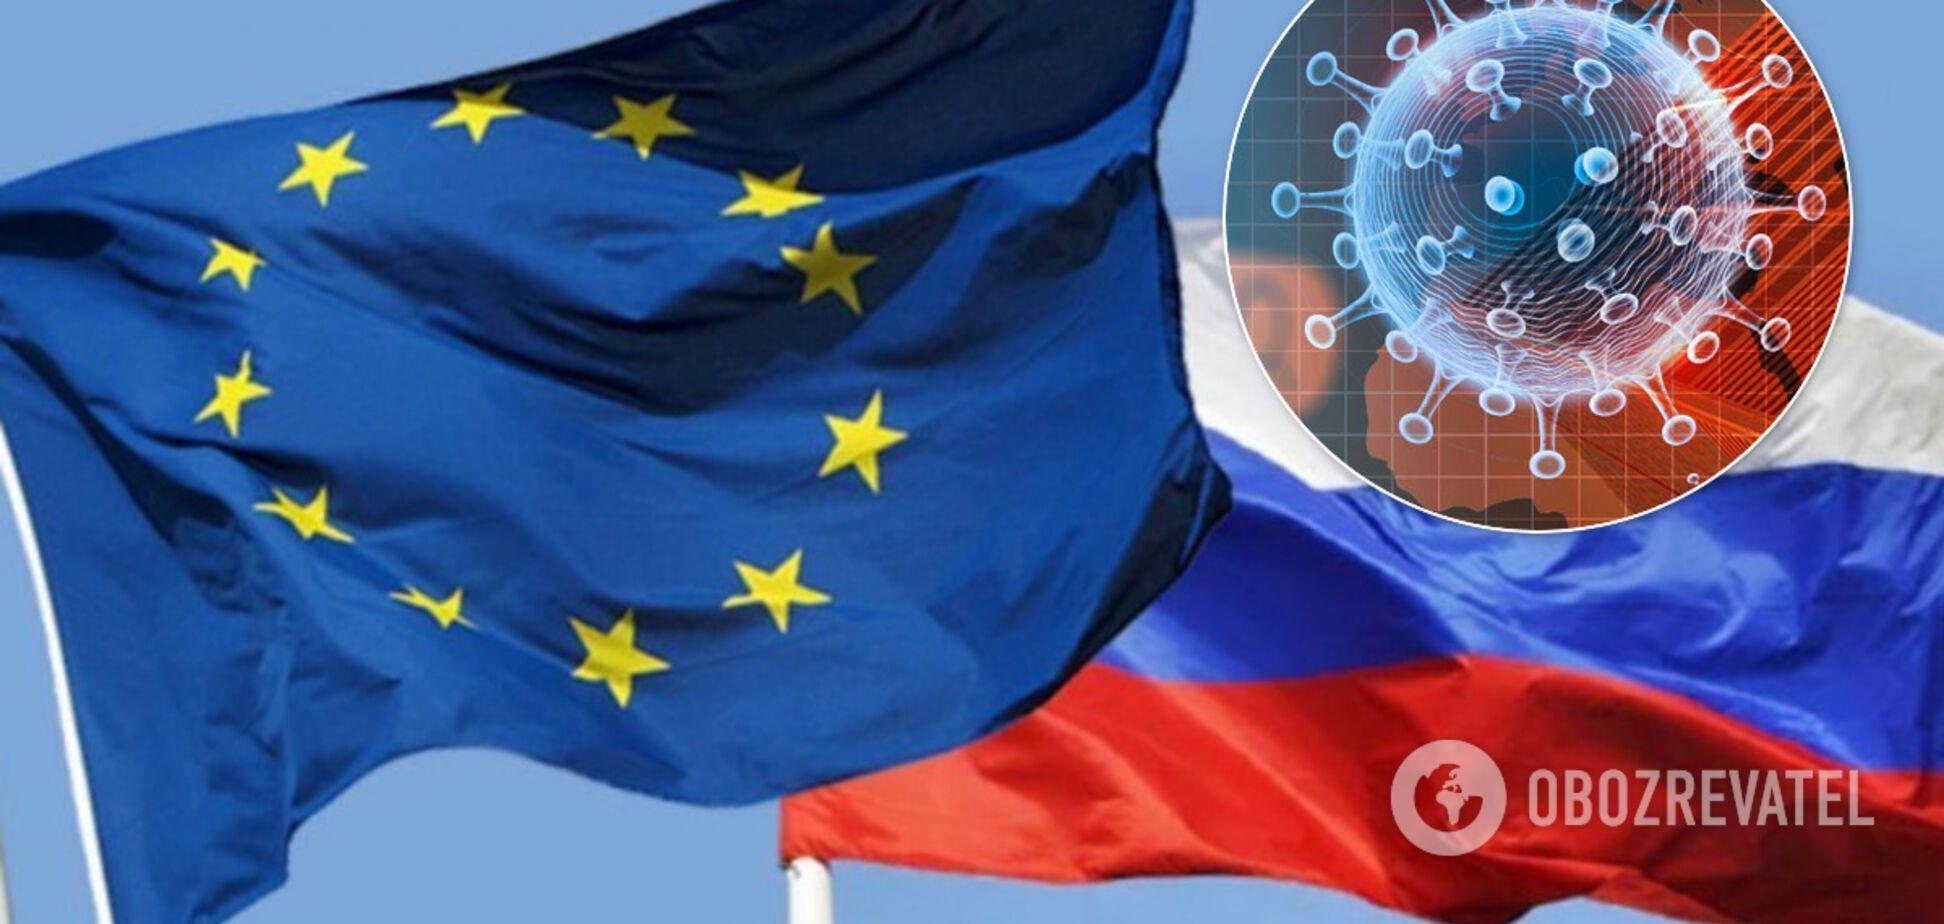 Санкции не отменят: в ЕС ответили на заявления России о COVID-19